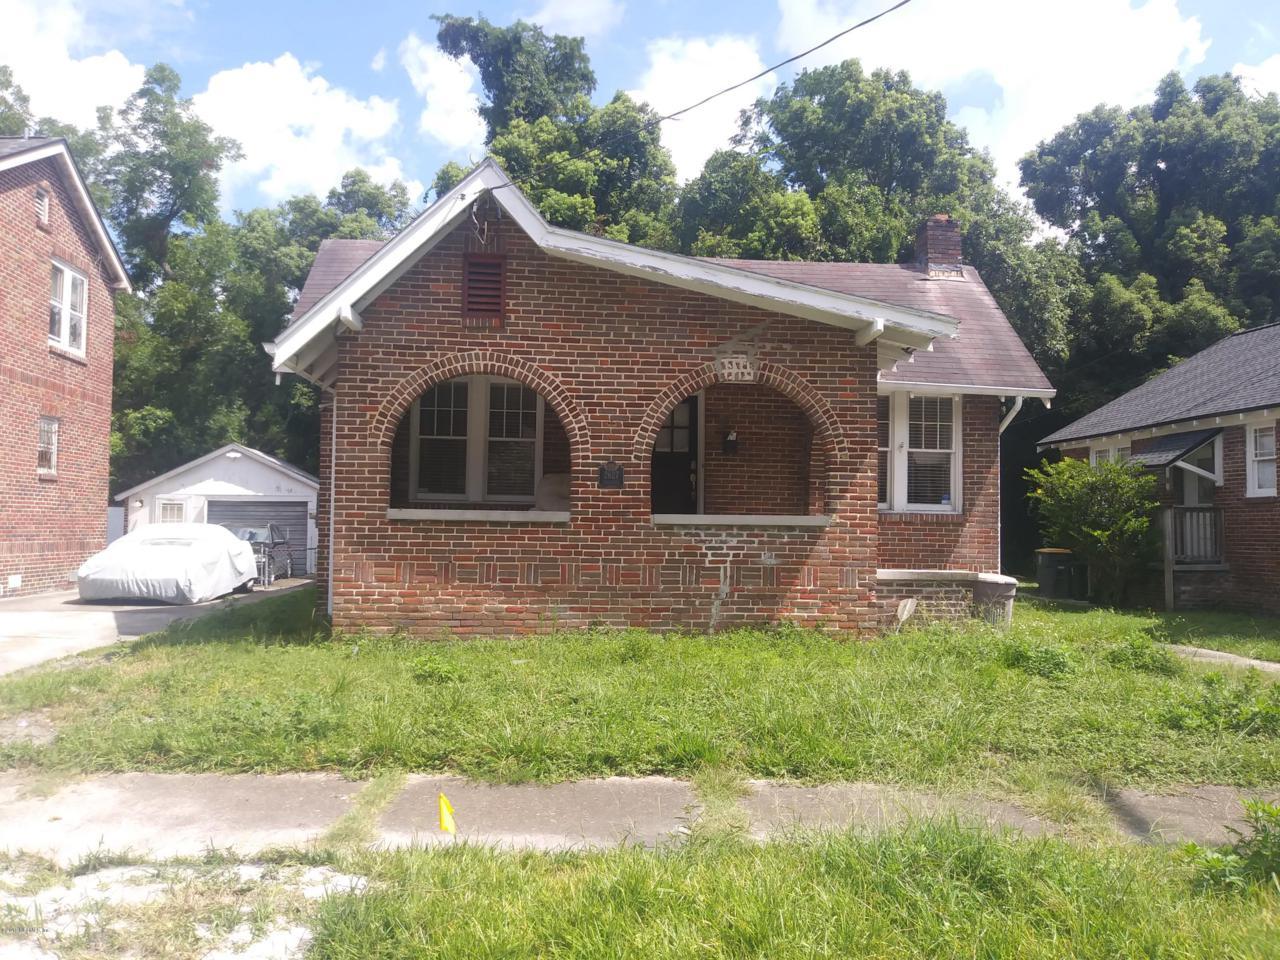 2627 Dellwood Ave - Photo 1